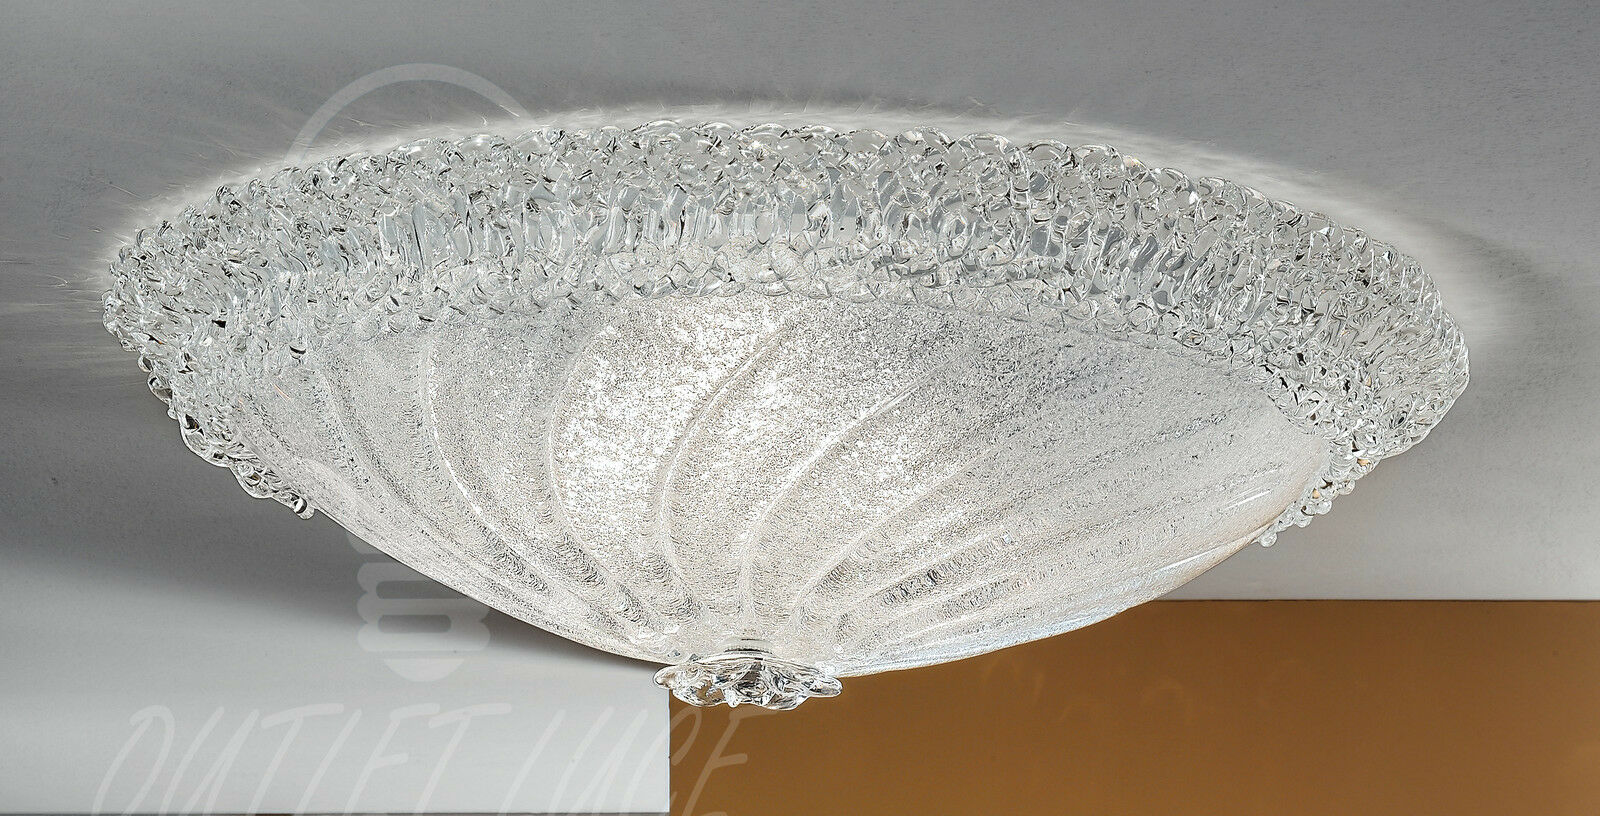 Plafoniera Tessuto Grande : Plafoniera gea luce modello luisa p g grande